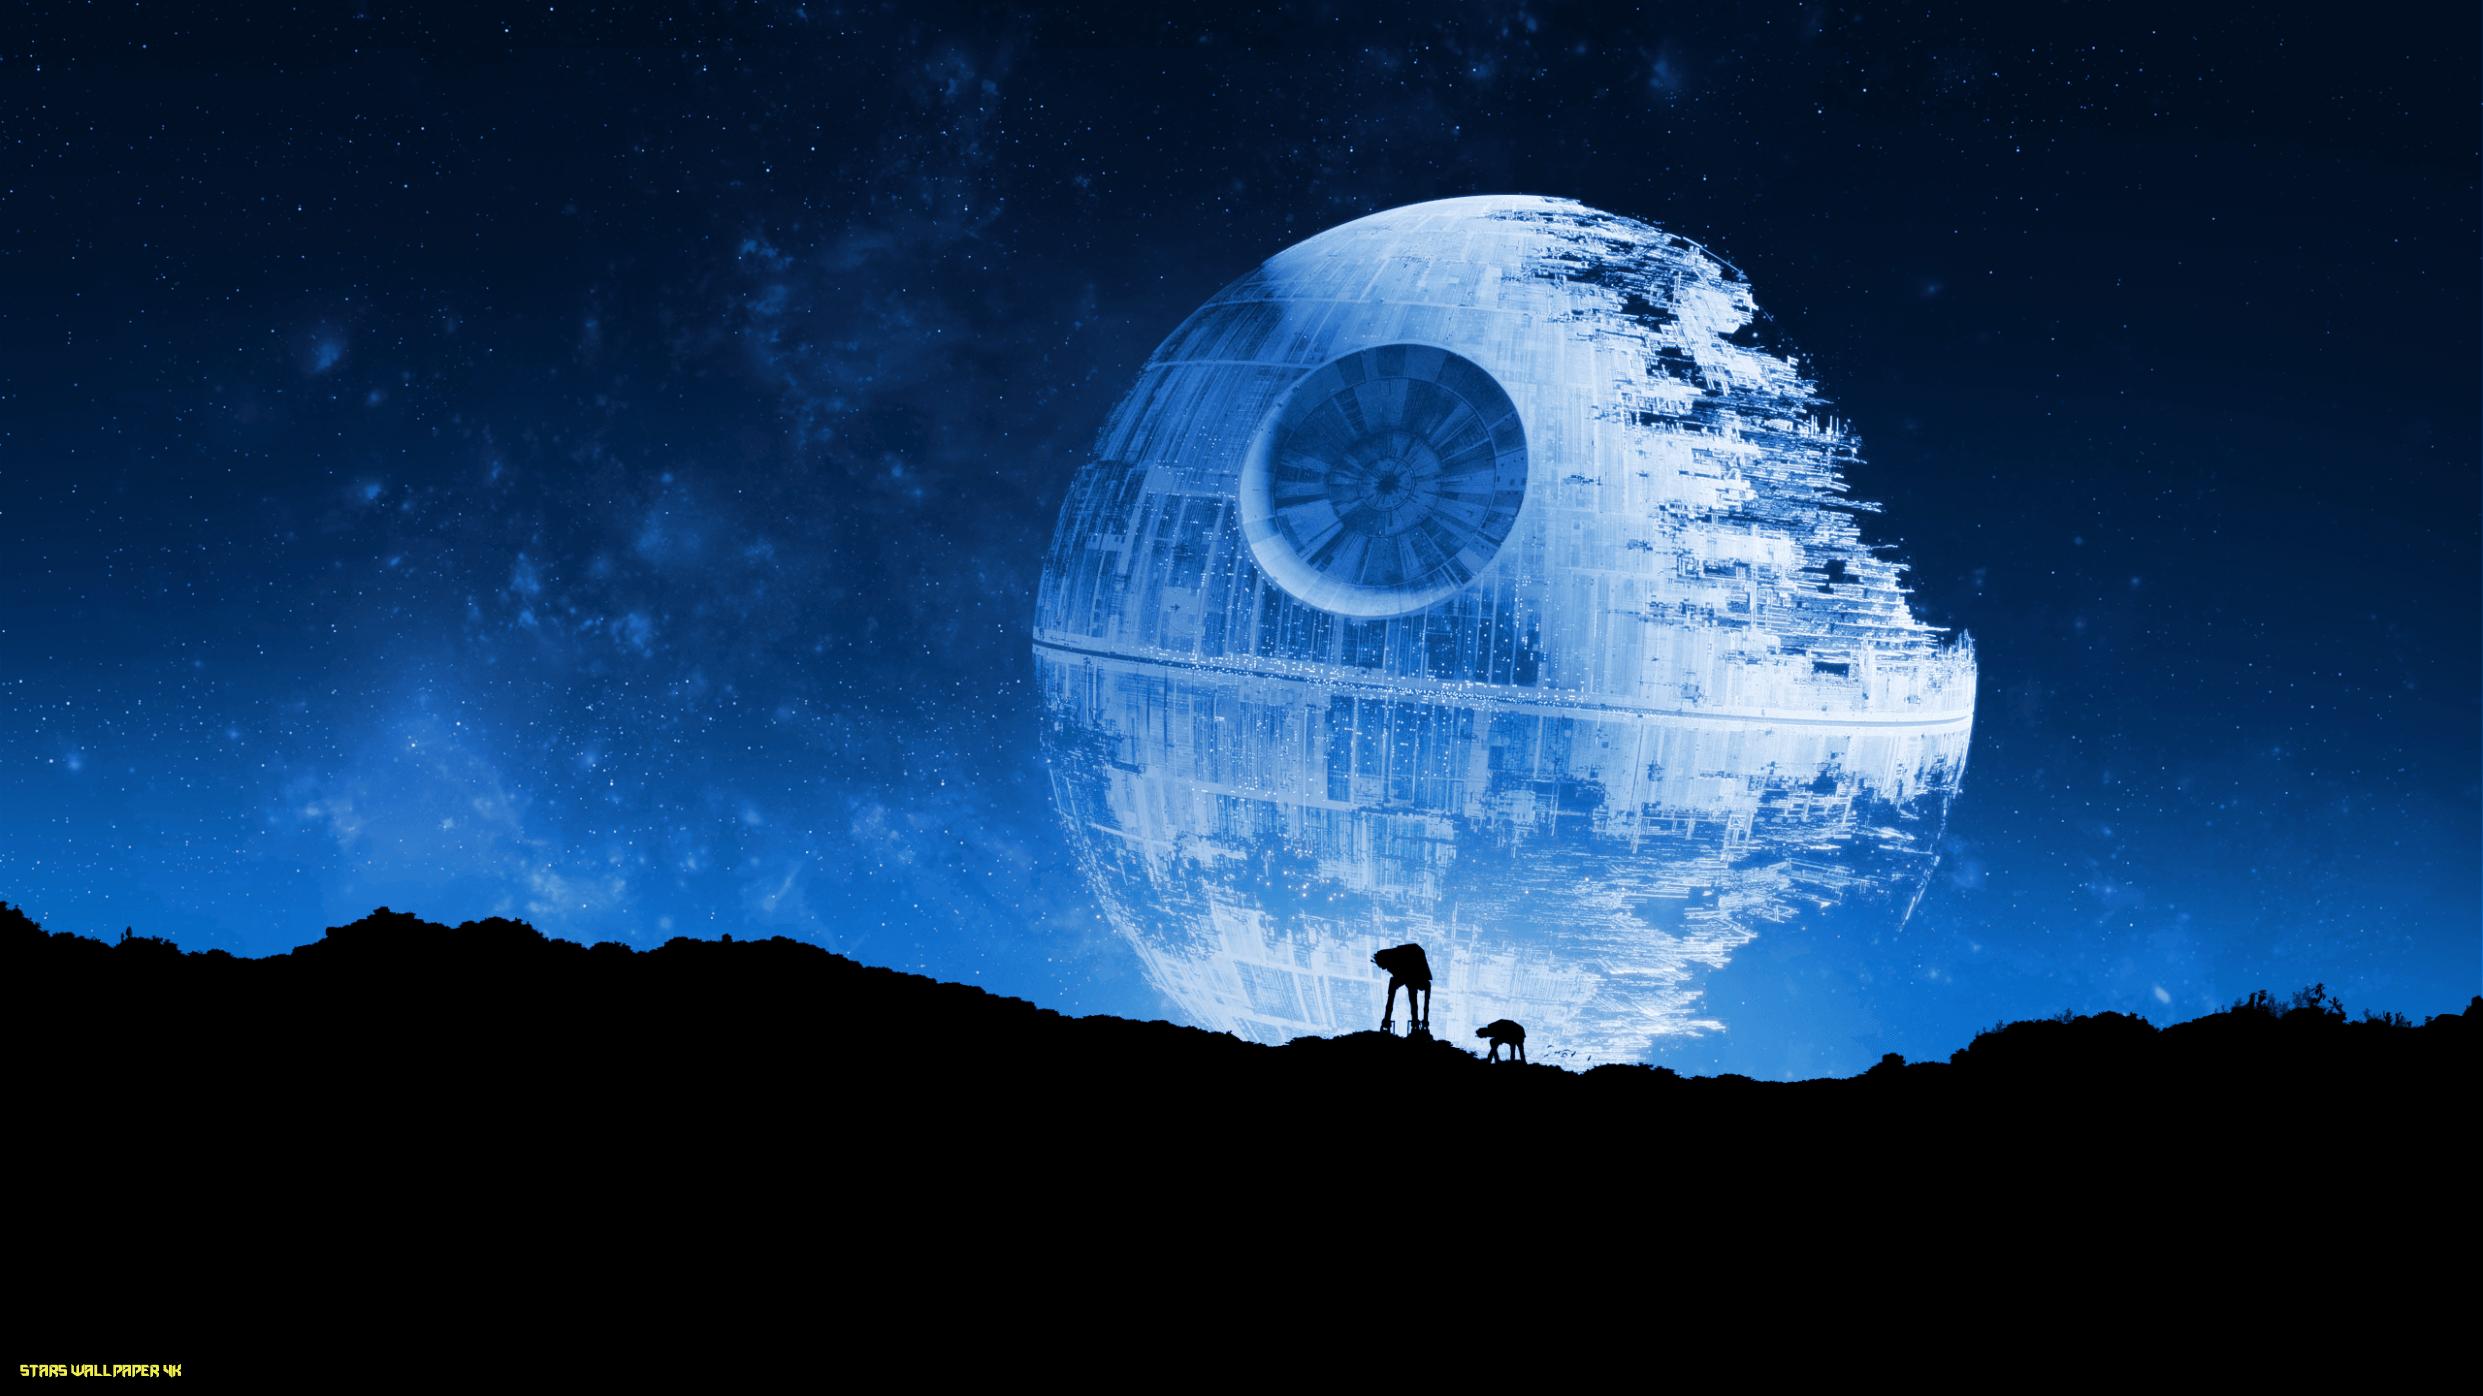 Fondos De Pantalla De Star Wars Fondosmil In 2020 Death Star Wallpaper Star Wallpaper Star Destroyer Wallpaper